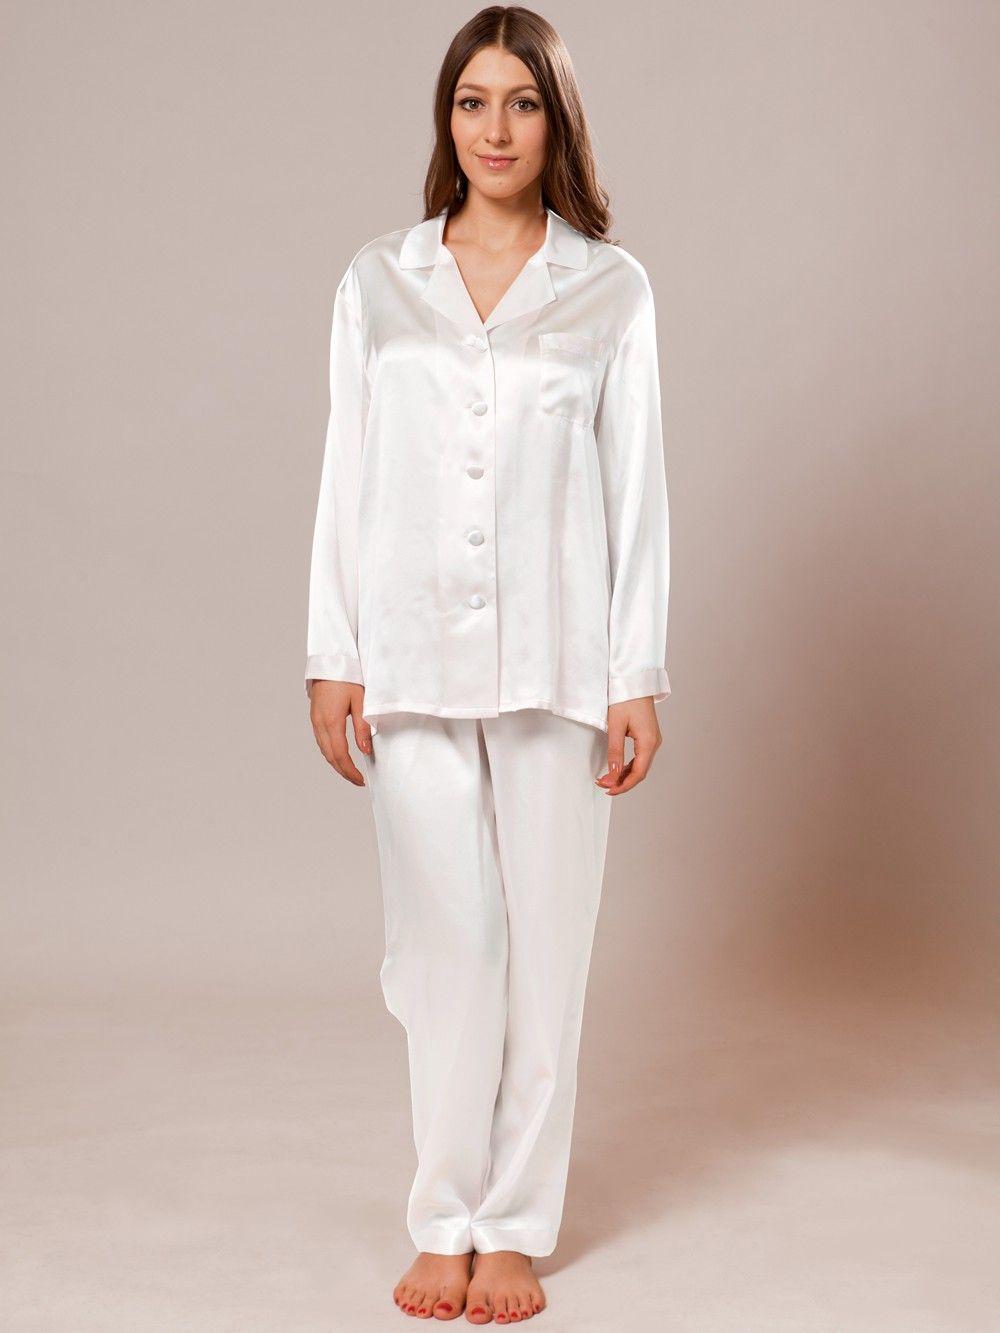 silk pajamas  silkpyjamas. silk pajamas  silkpyjamas Silk Sleepwear ... 5630e0581